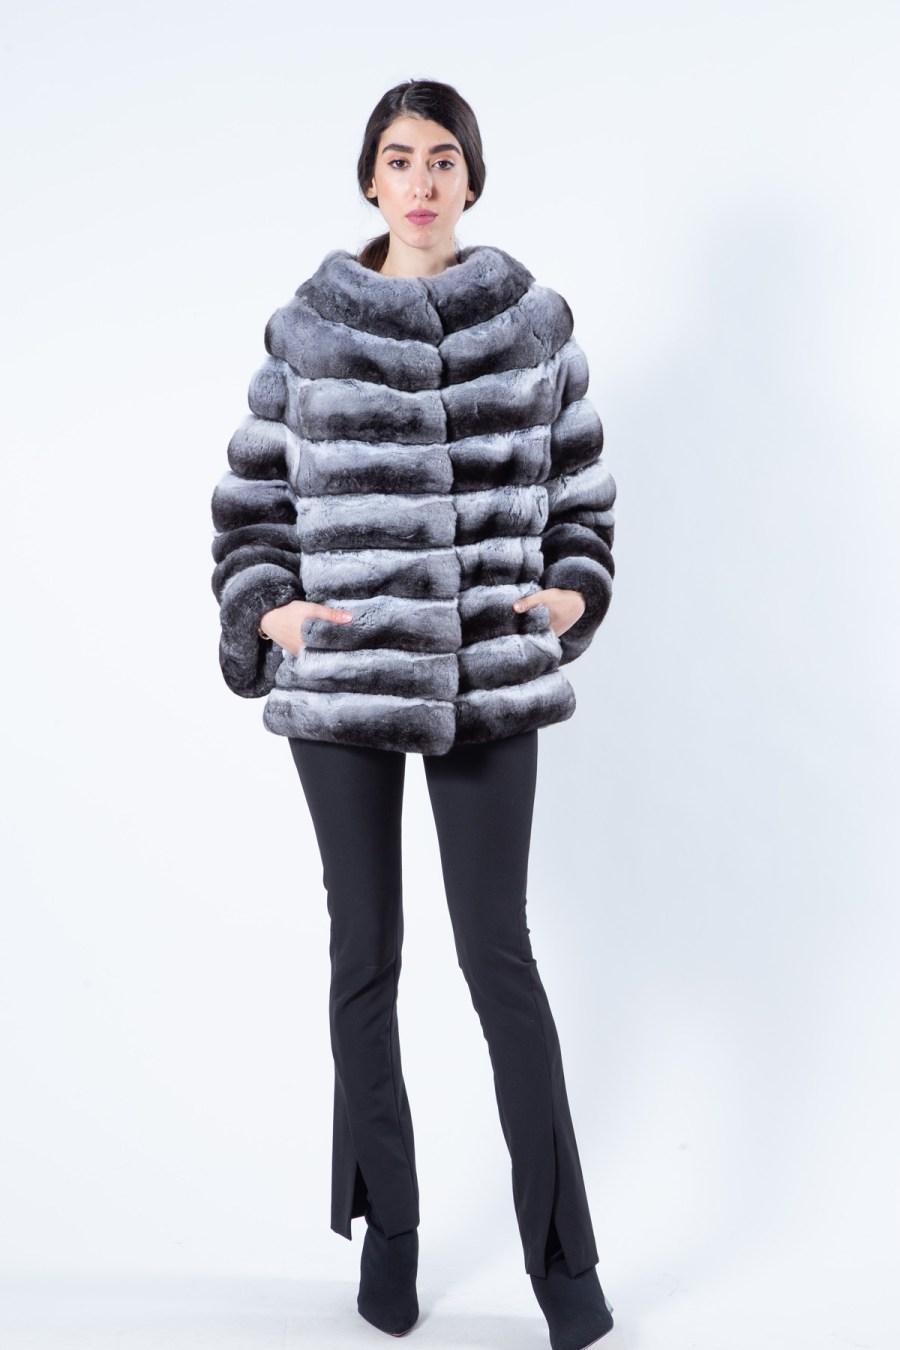 Chinchilla Fur Jacket with 7/8 sleeves | Sarigianni Furs